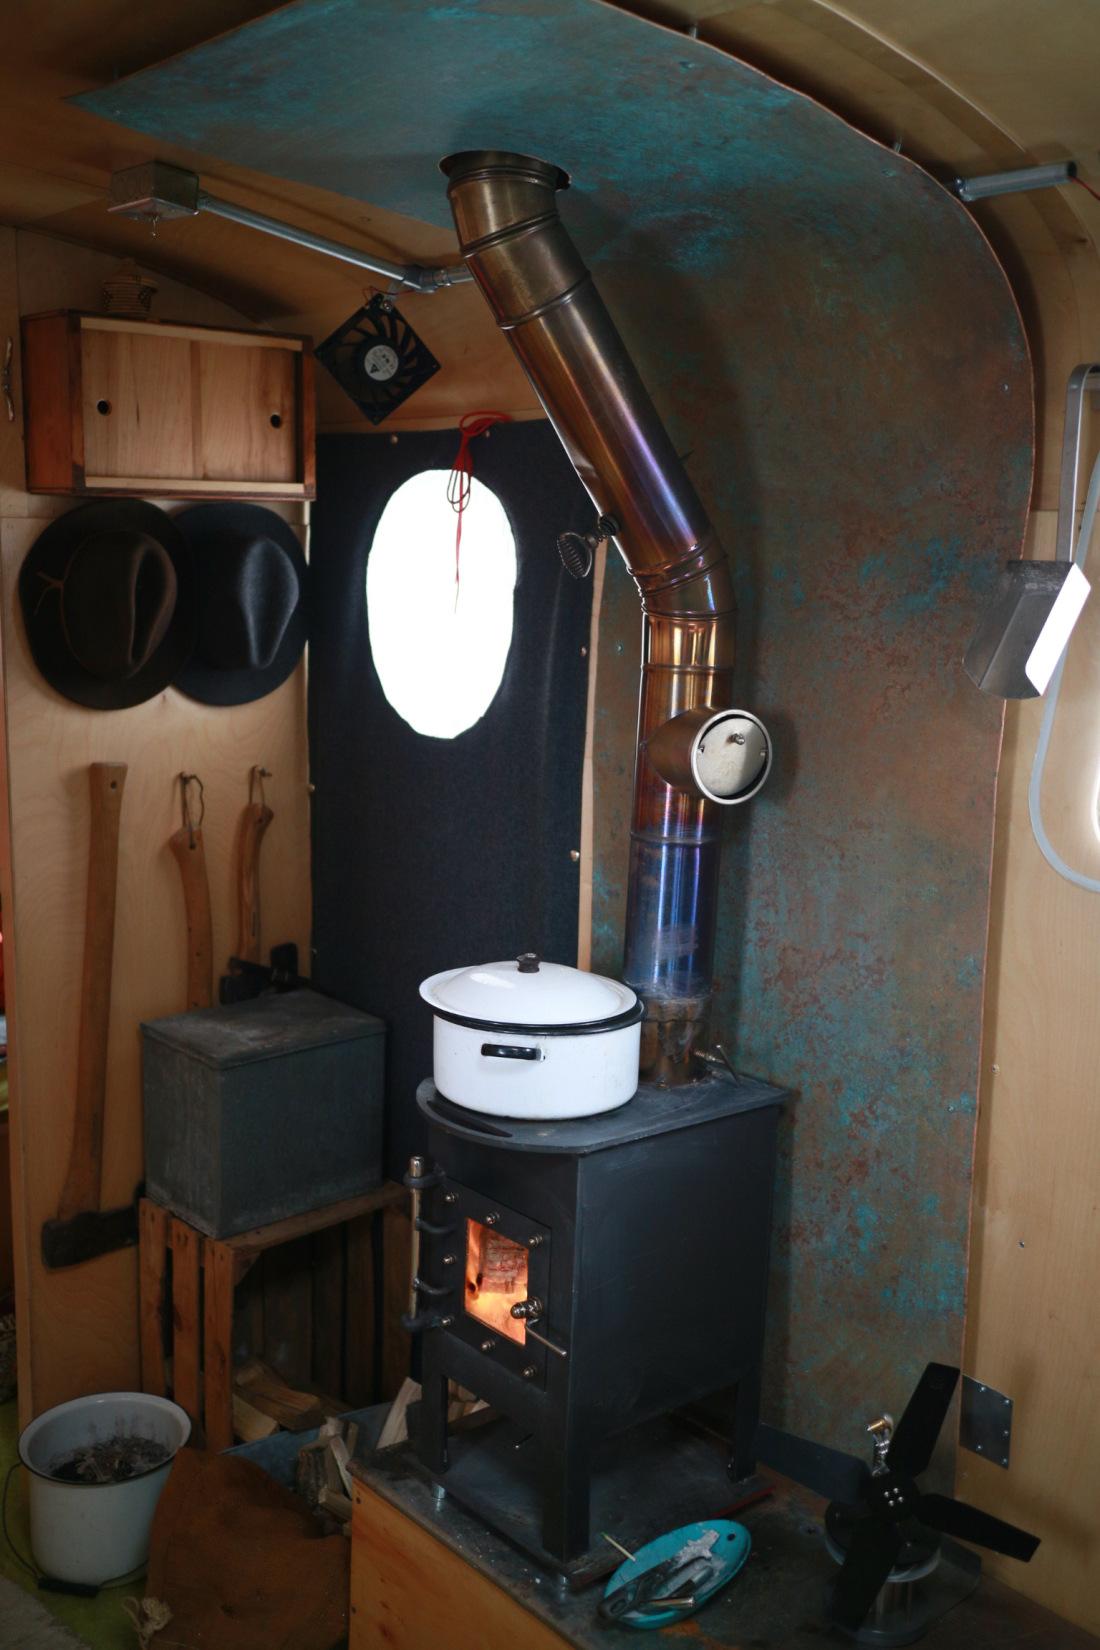 Arctic Wasp woodburner - www.stovedesign.com/arcticwasp